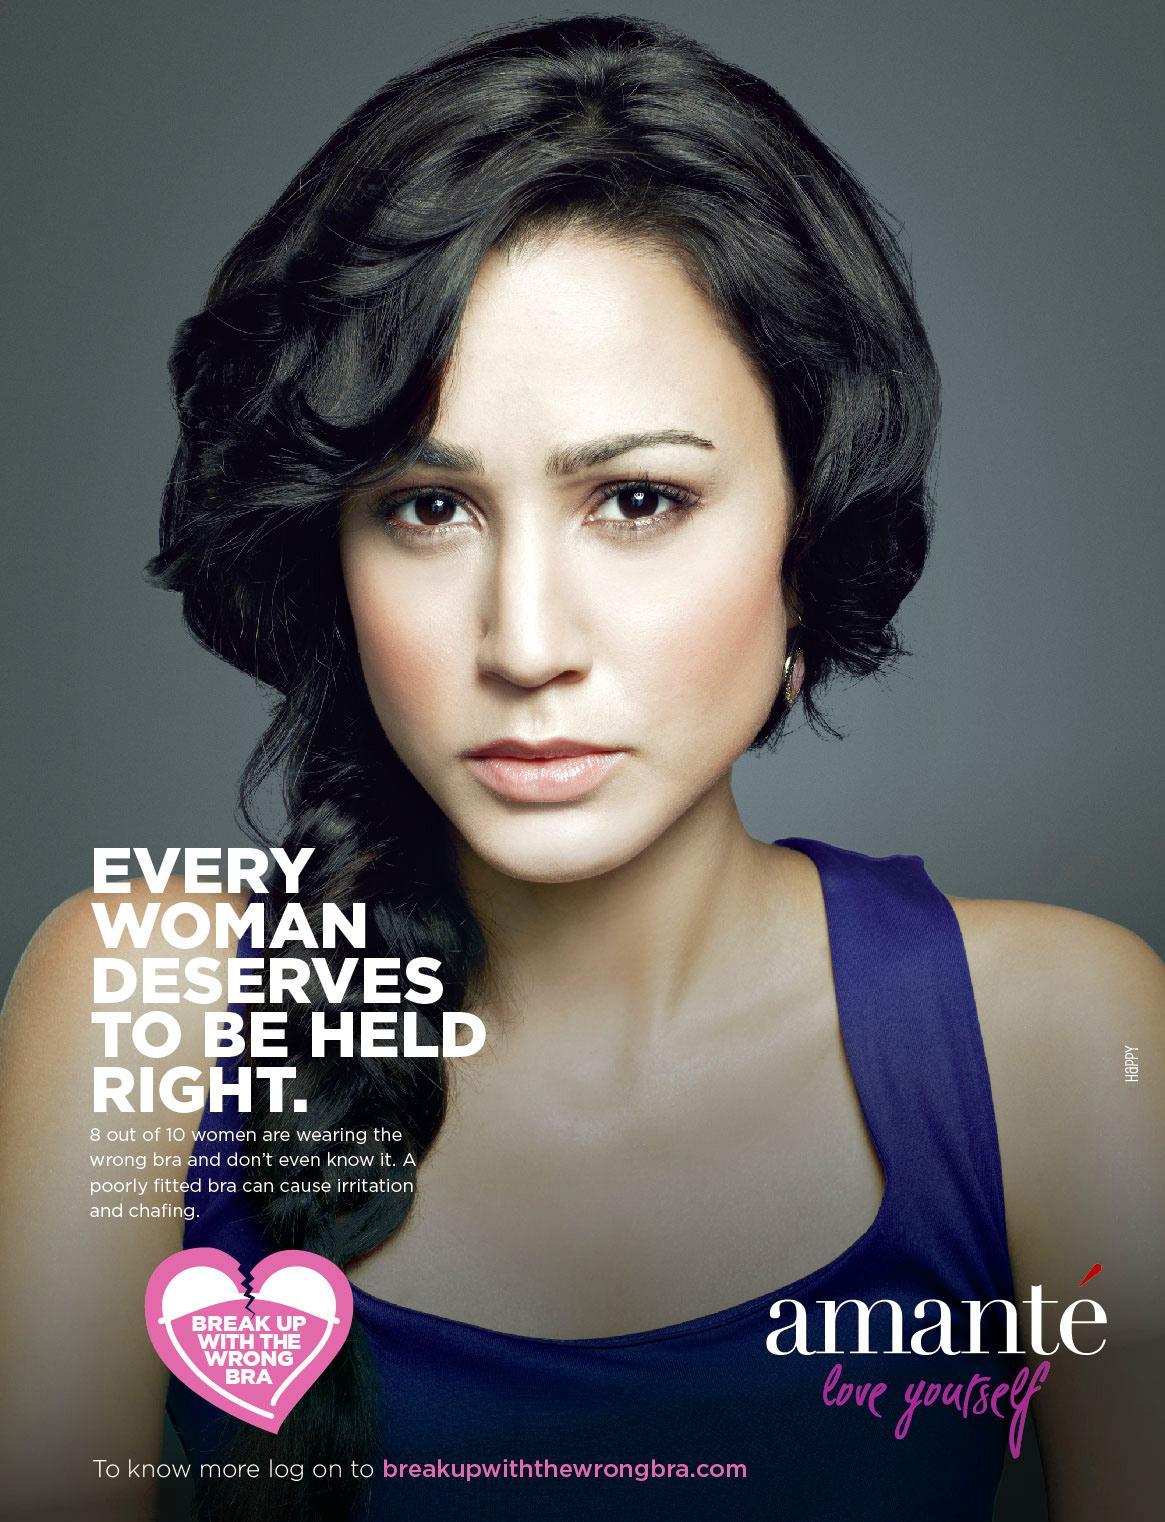 Amanté Print Ad -  Break up the wrong bra, 3